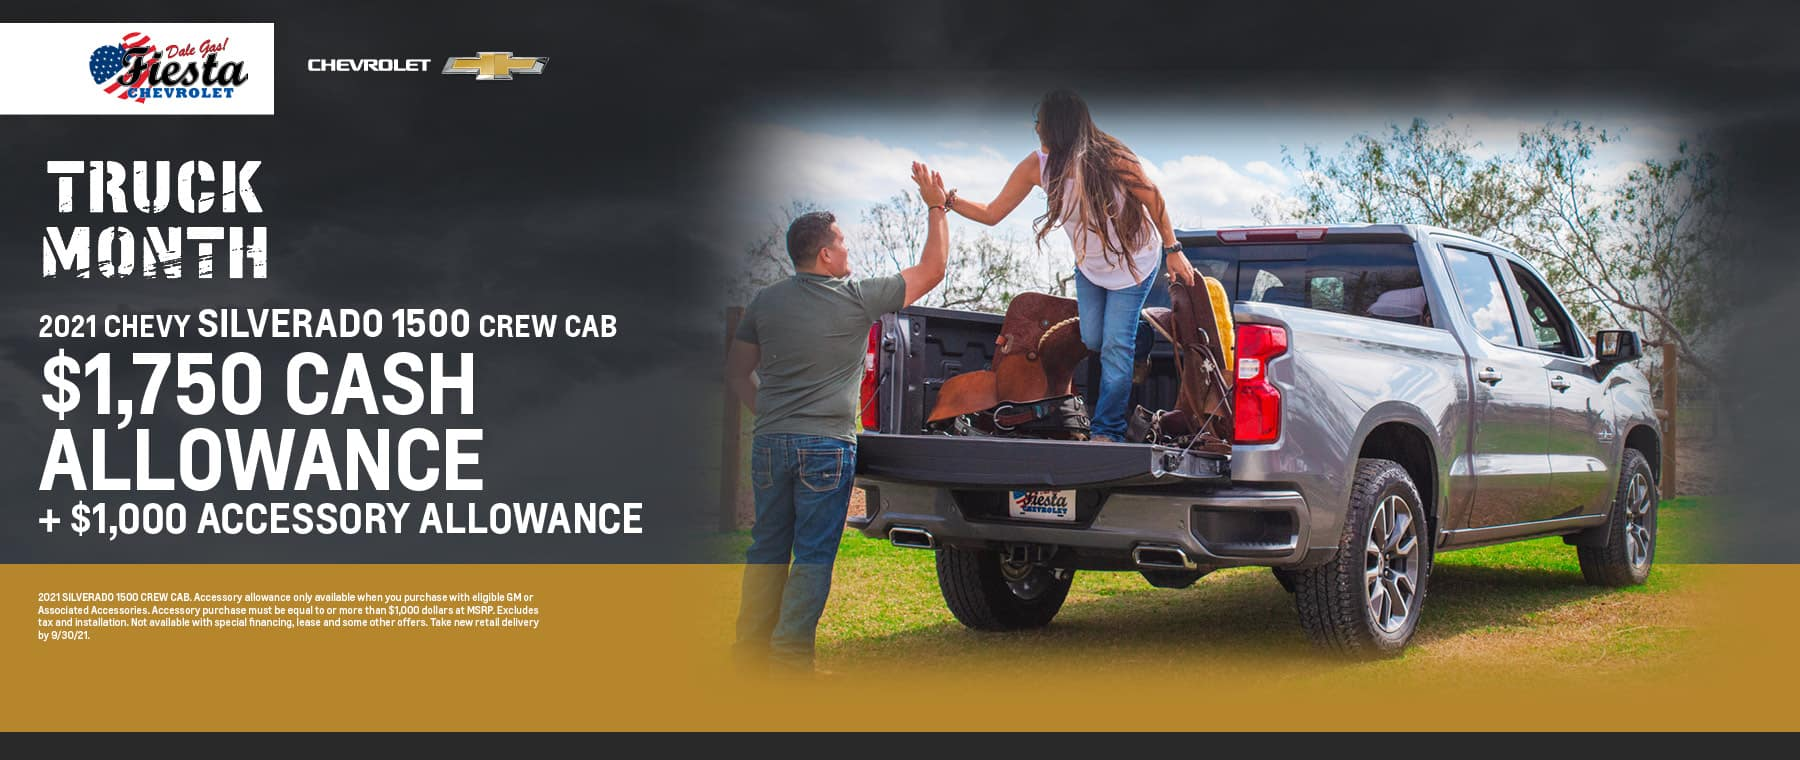 2021 Chevrolet Silverado 1500 Crew Cab Offers | Fiesta Chevrolet in Edinburg, Texas